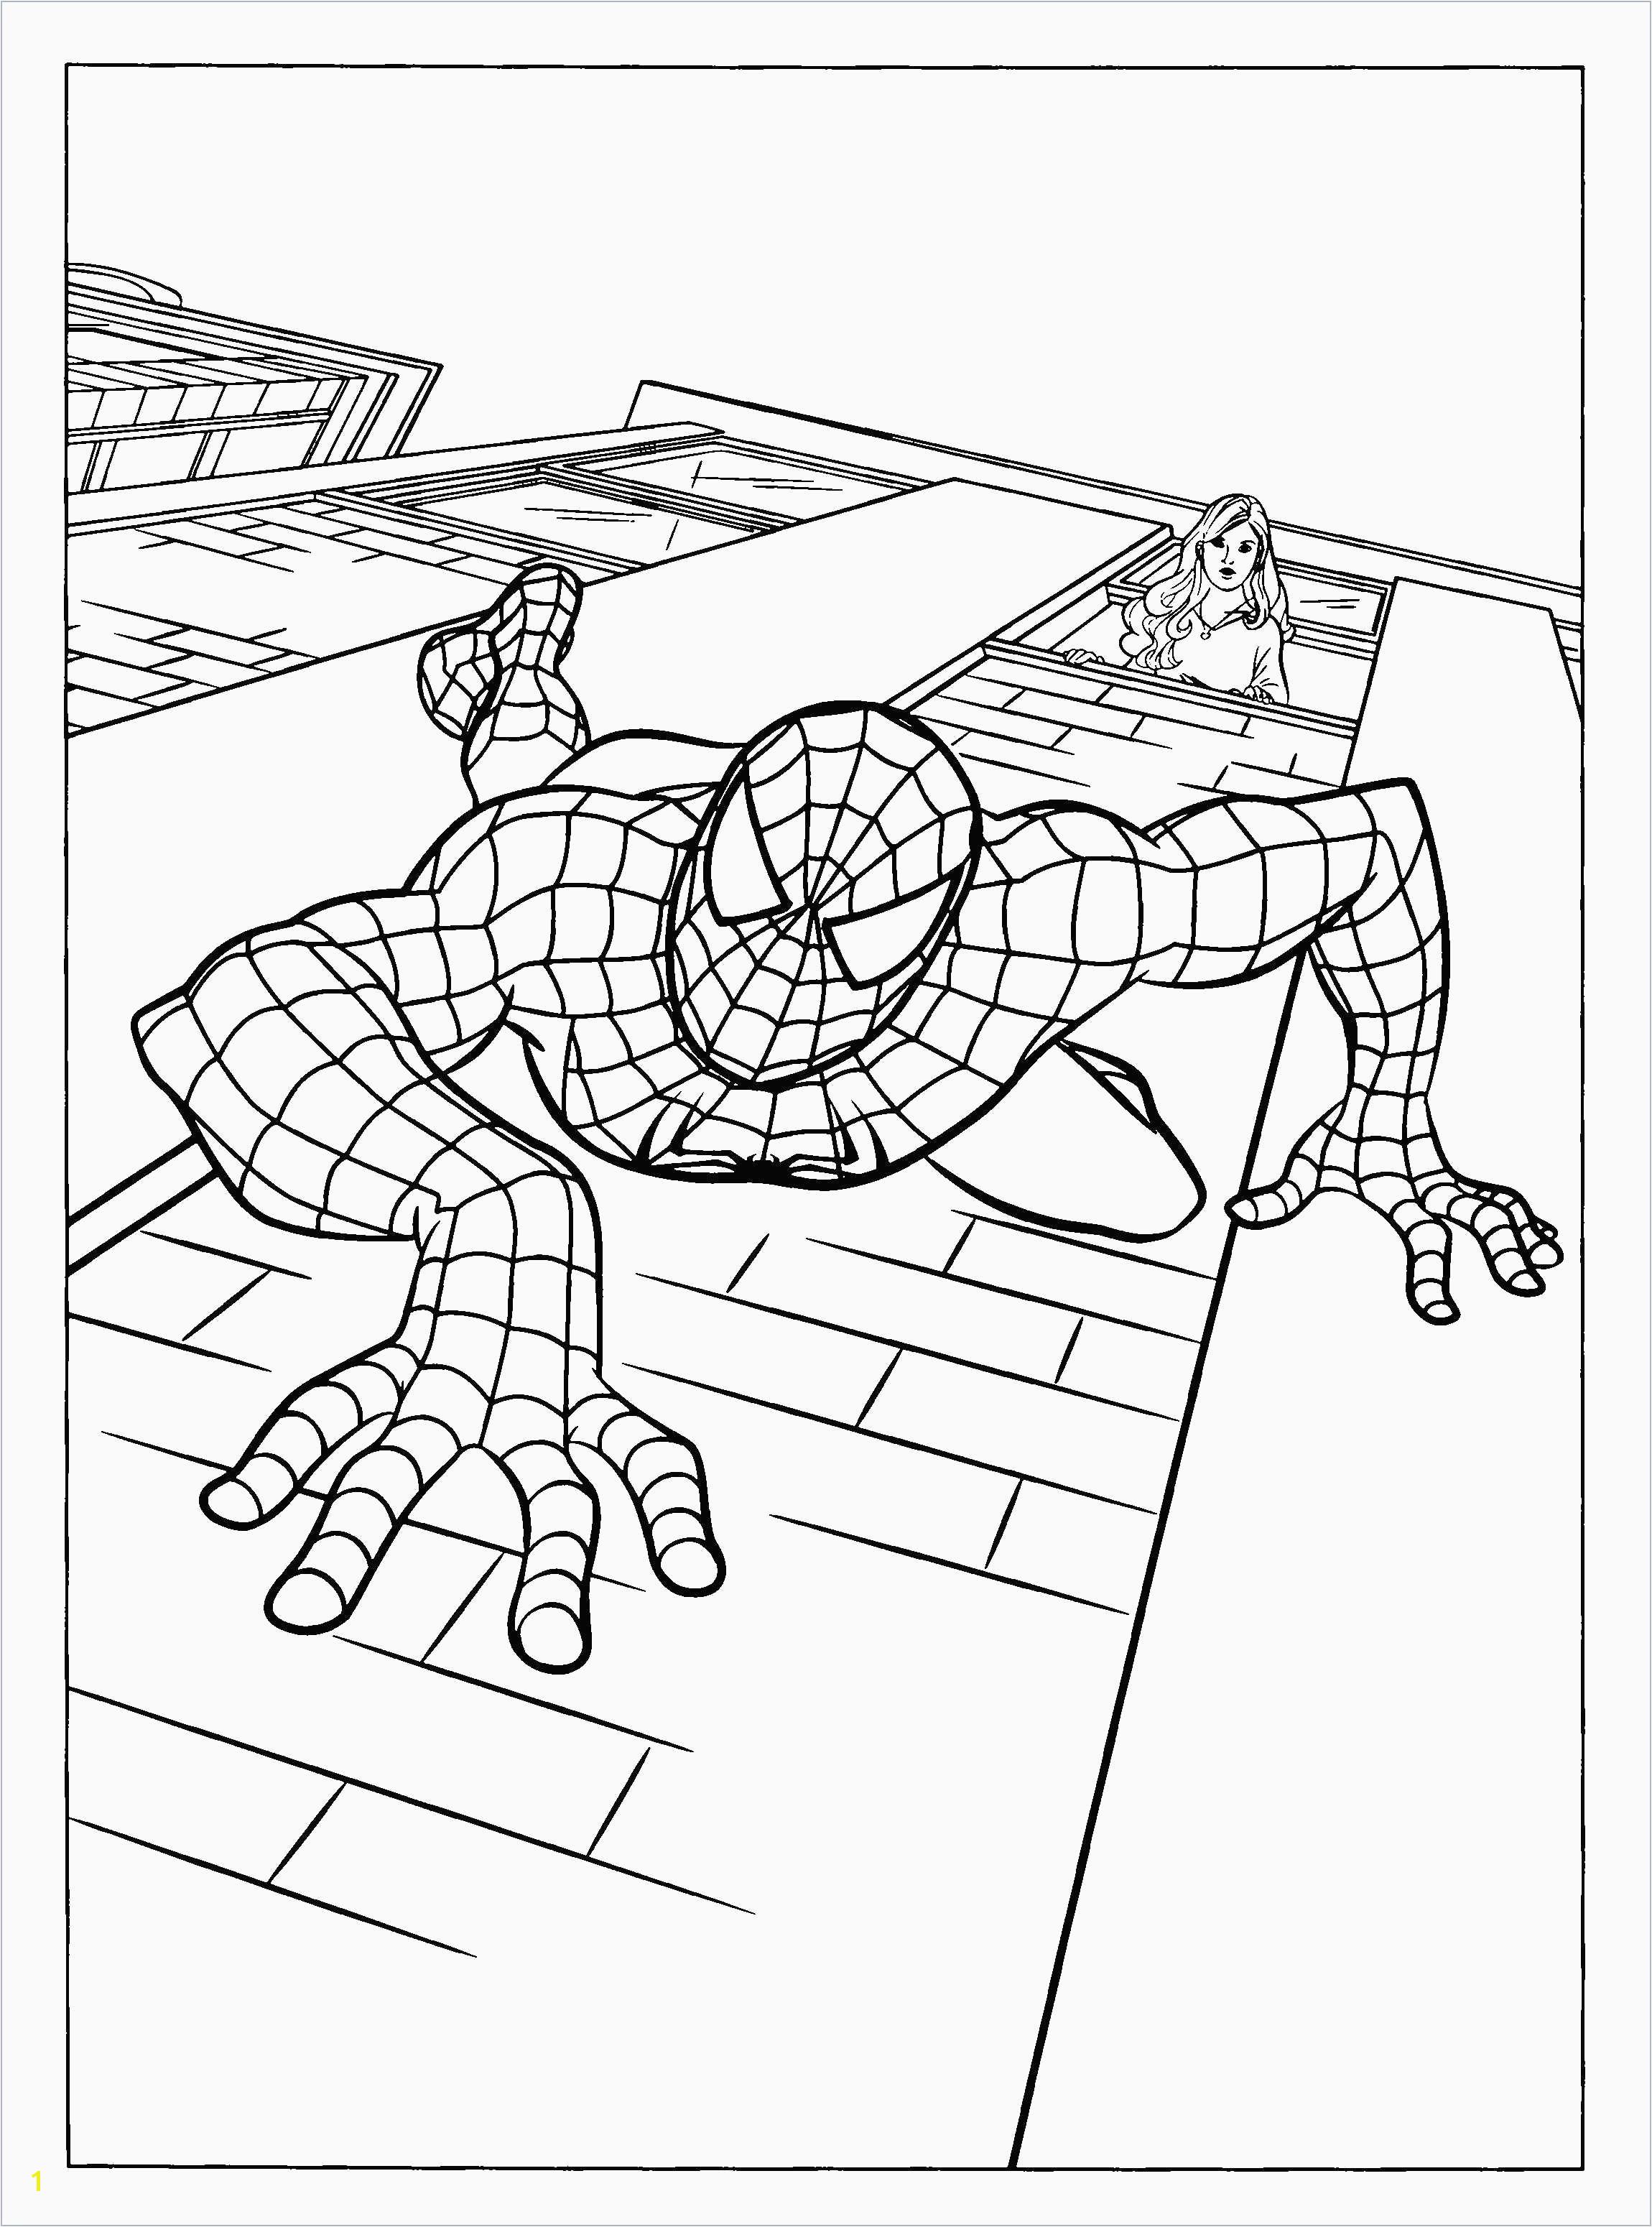 Free Printable Spiderman Coloring Pages Unique Spiderman Coloring Sheets Lovely Ic Coloring Pages Best 0 0d